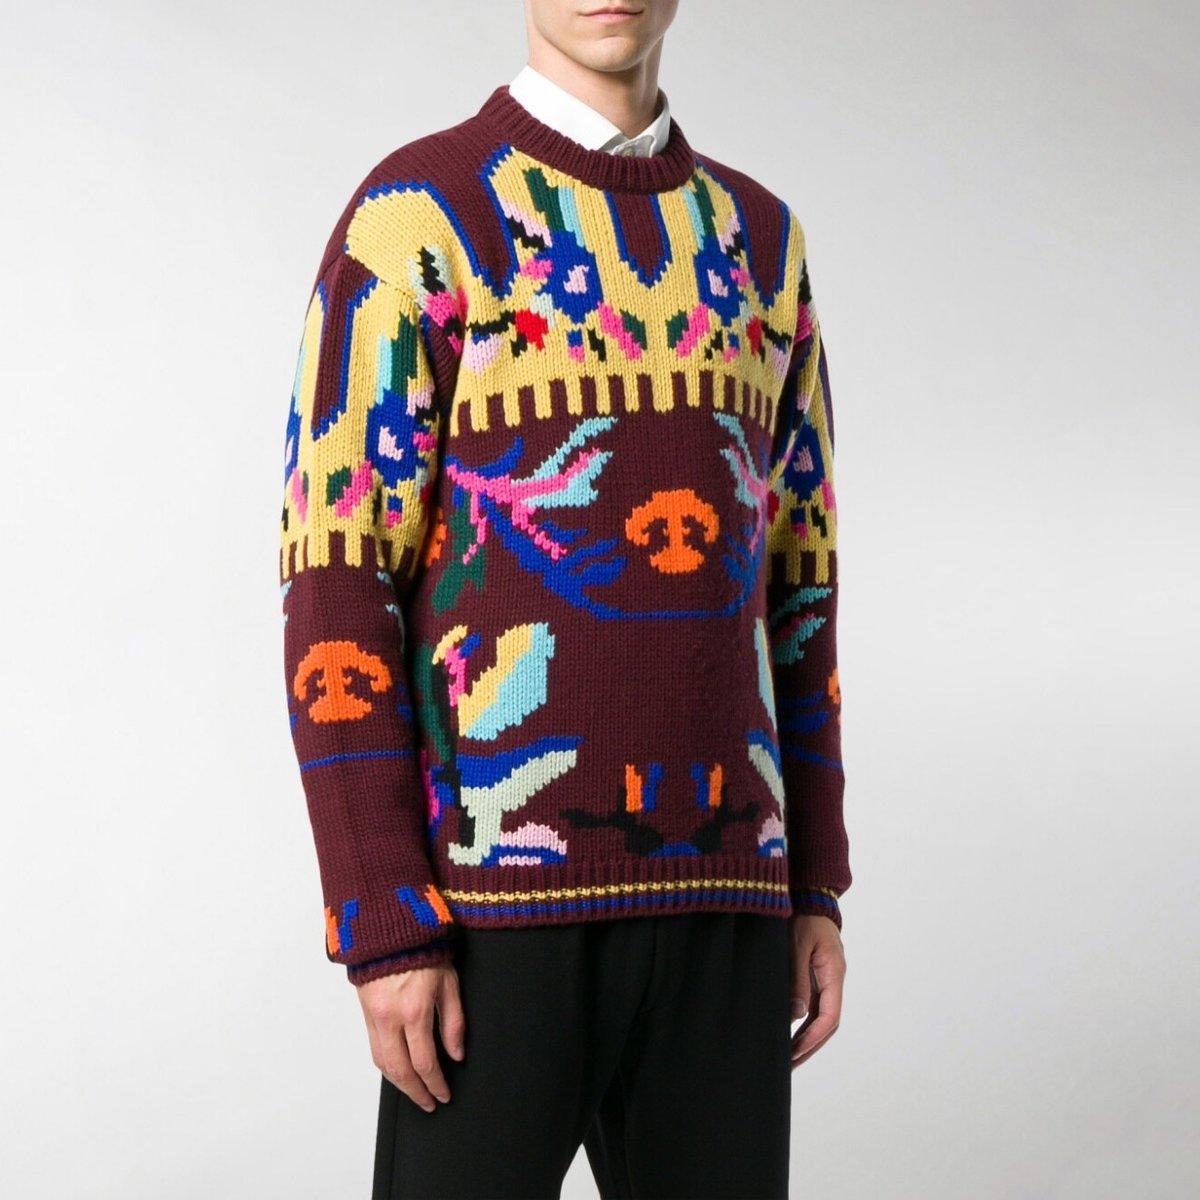 prada-intarsia-knit-sweater_13195880_15625664_1000.jpg